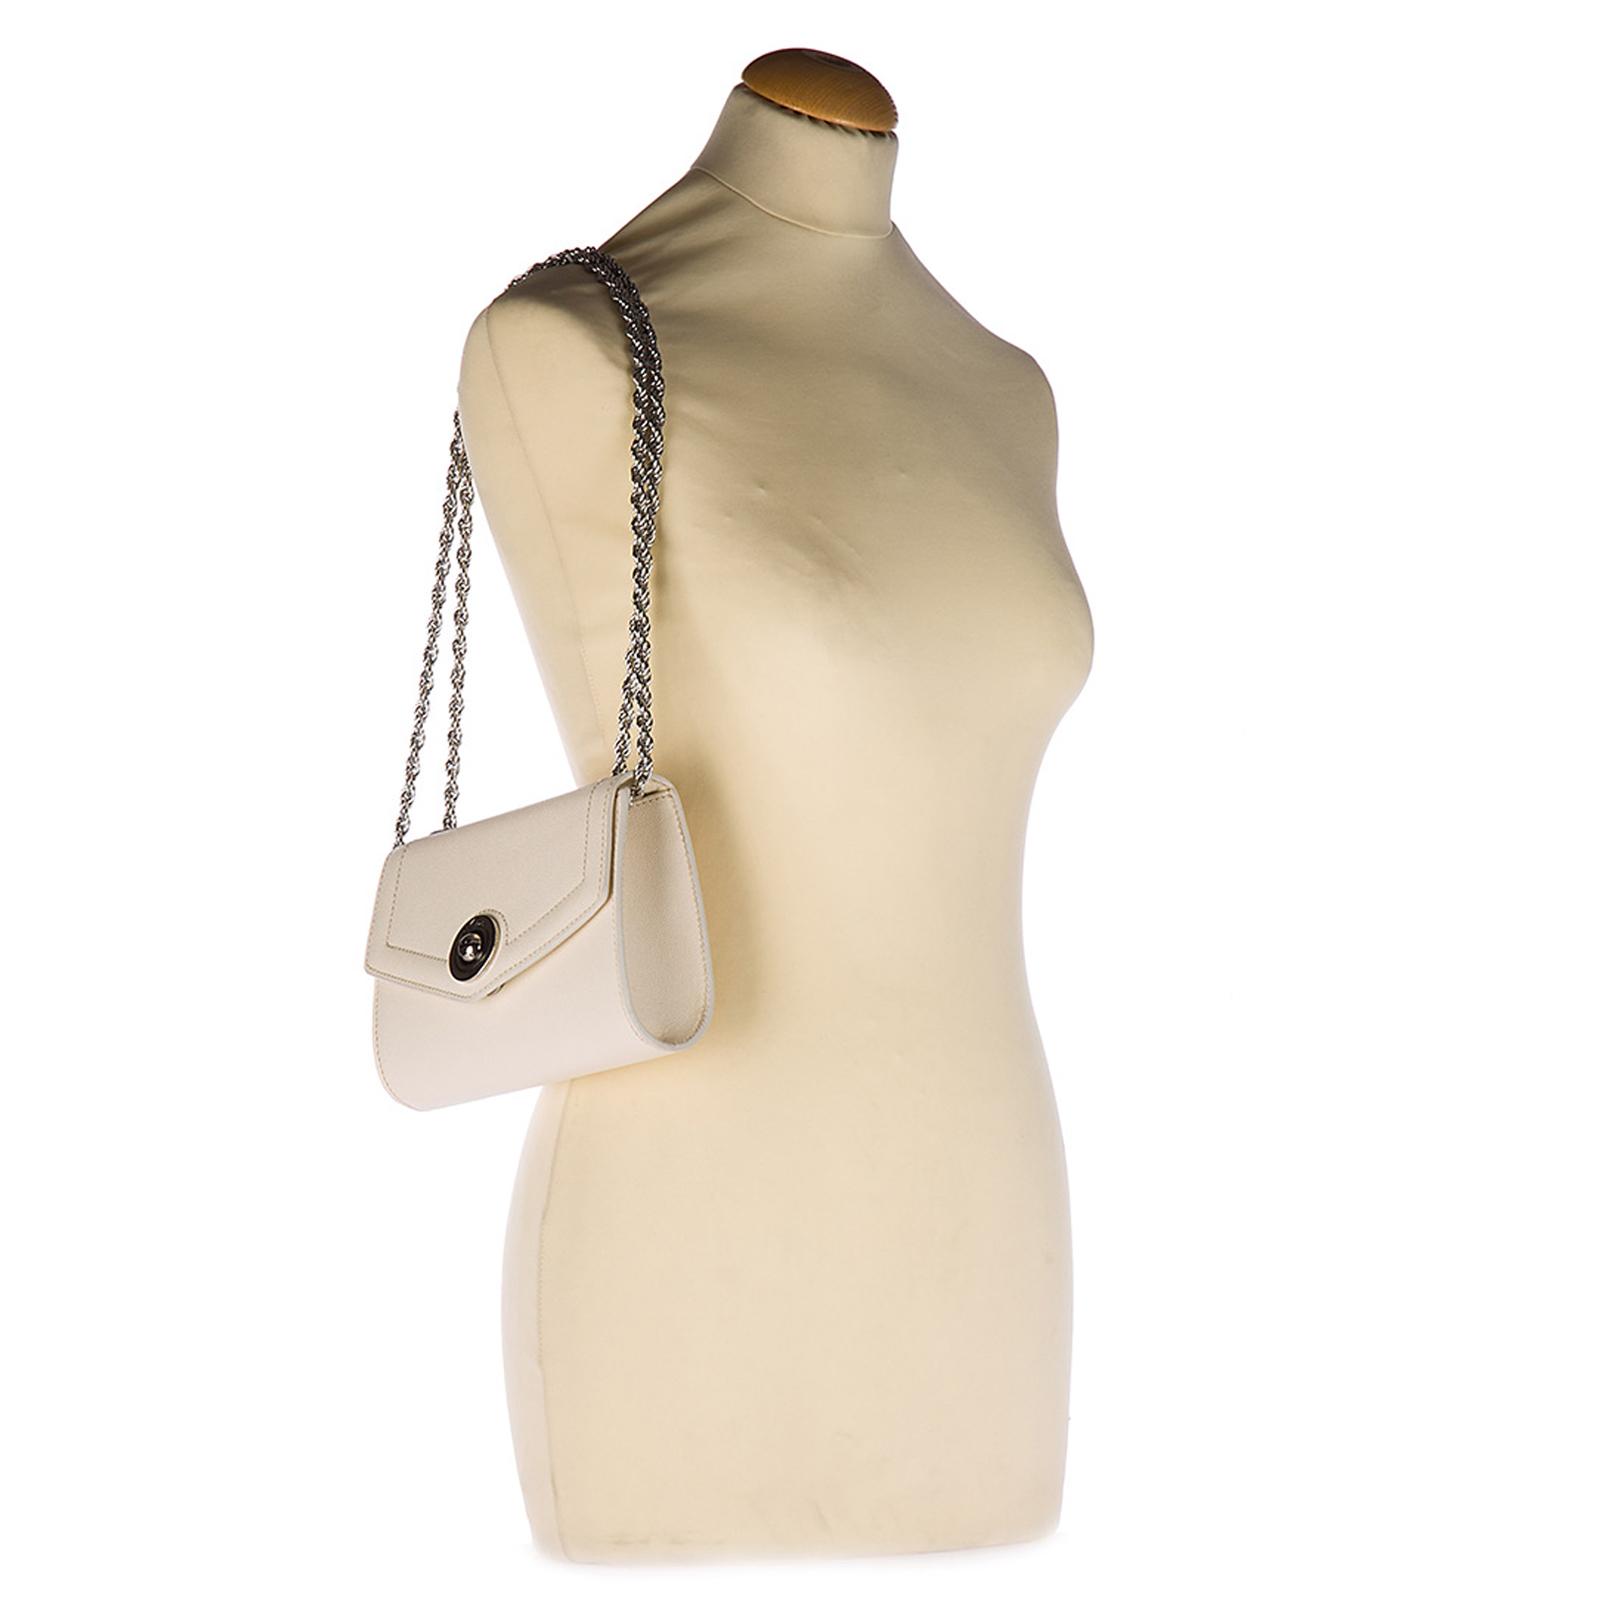 Women's clutch with shoulder strap handbag bag purse  antibes